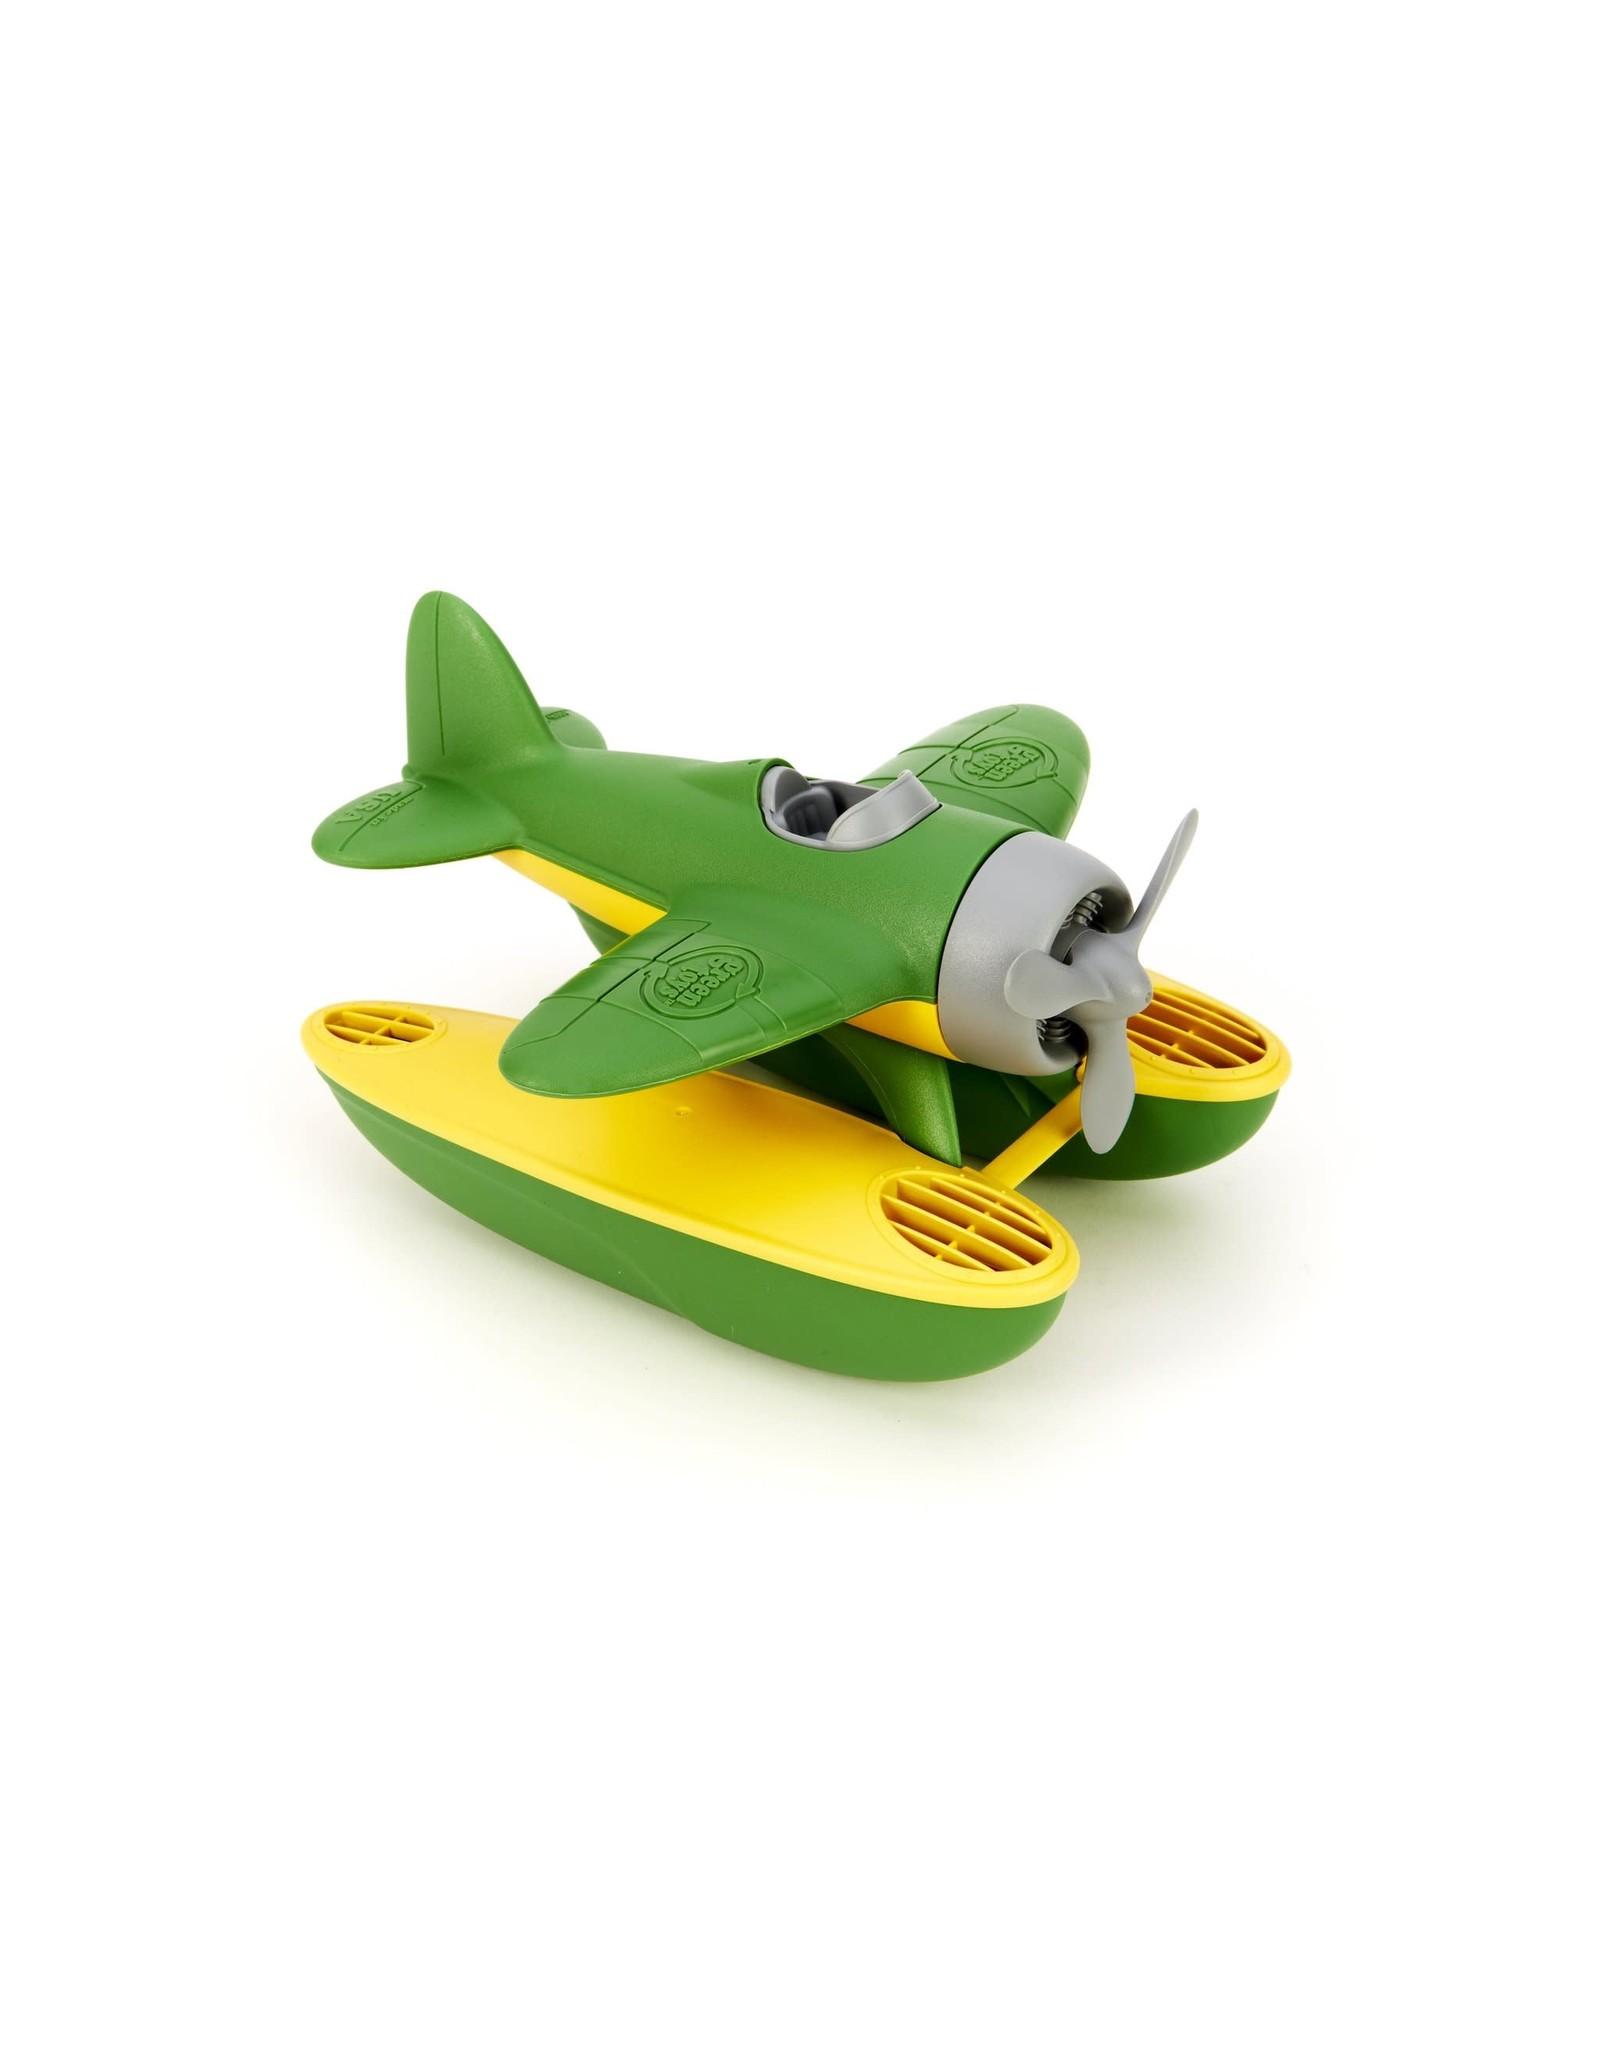 Green Toys Green Toys Seaplane Asst.